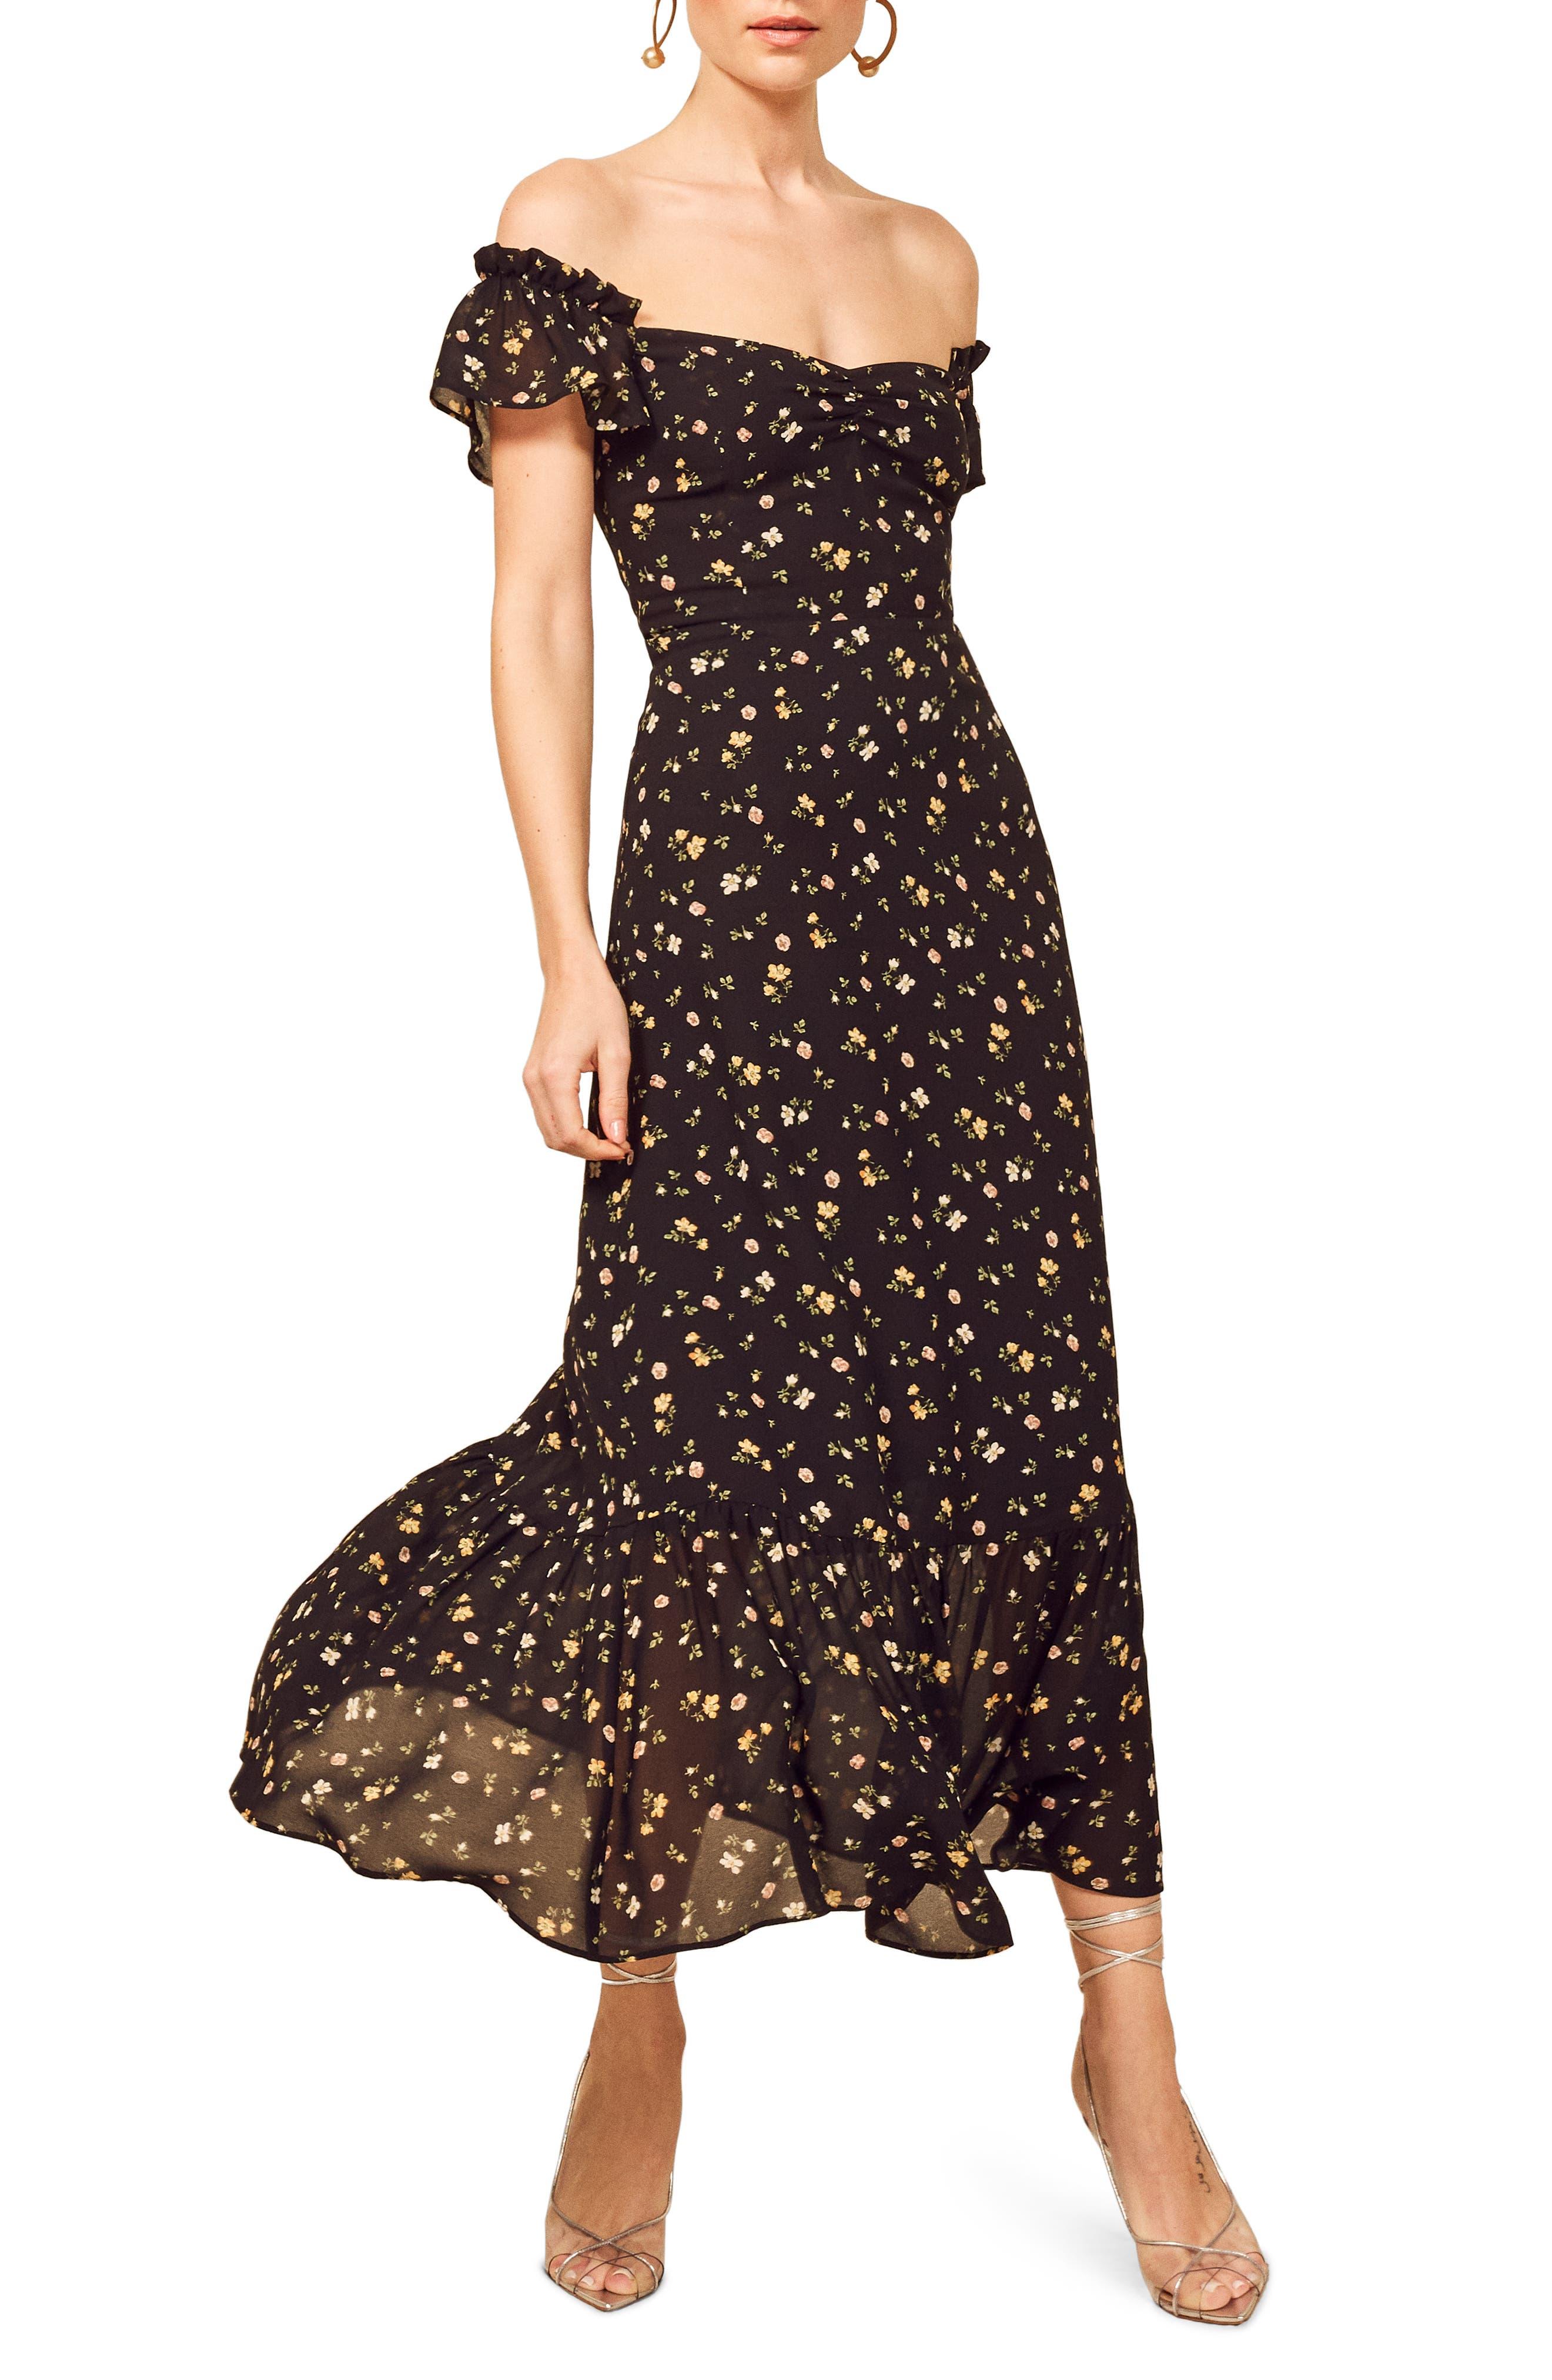 Reformation Butterfly Midi Dress, Black